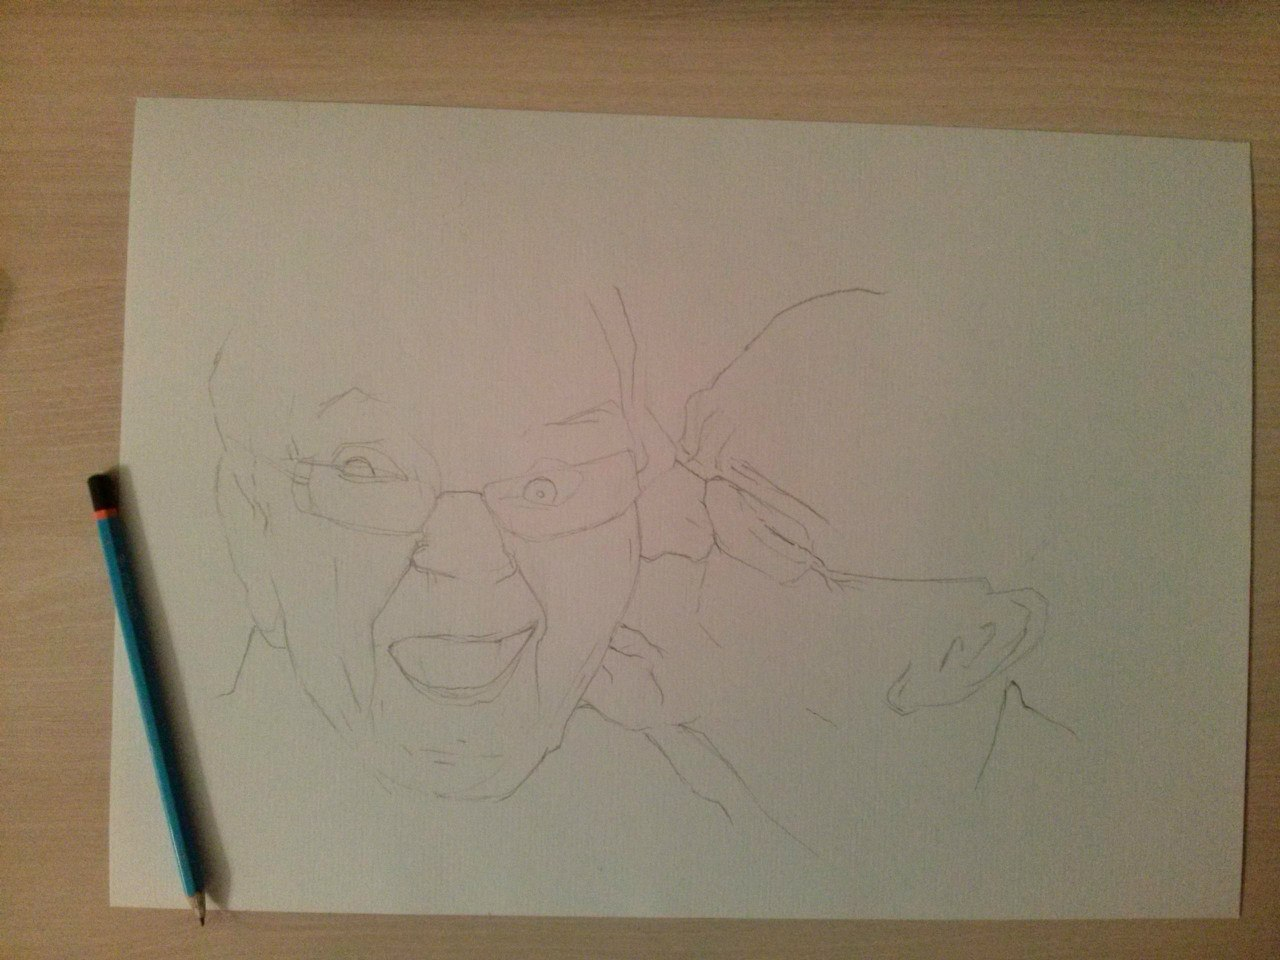 картинки карандашом на тему любовь